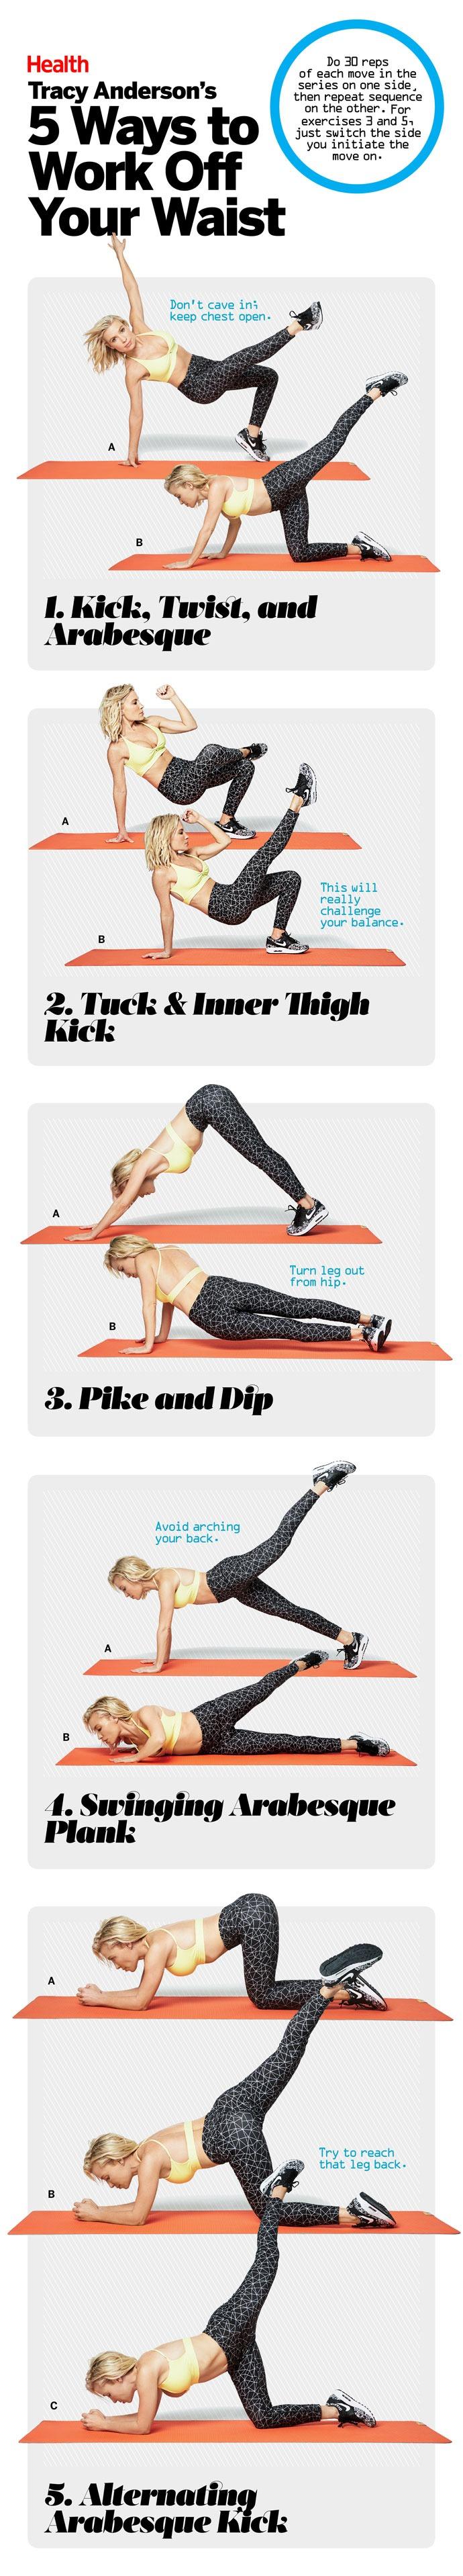 5 ways to work off your waist ASAP. | Health.com